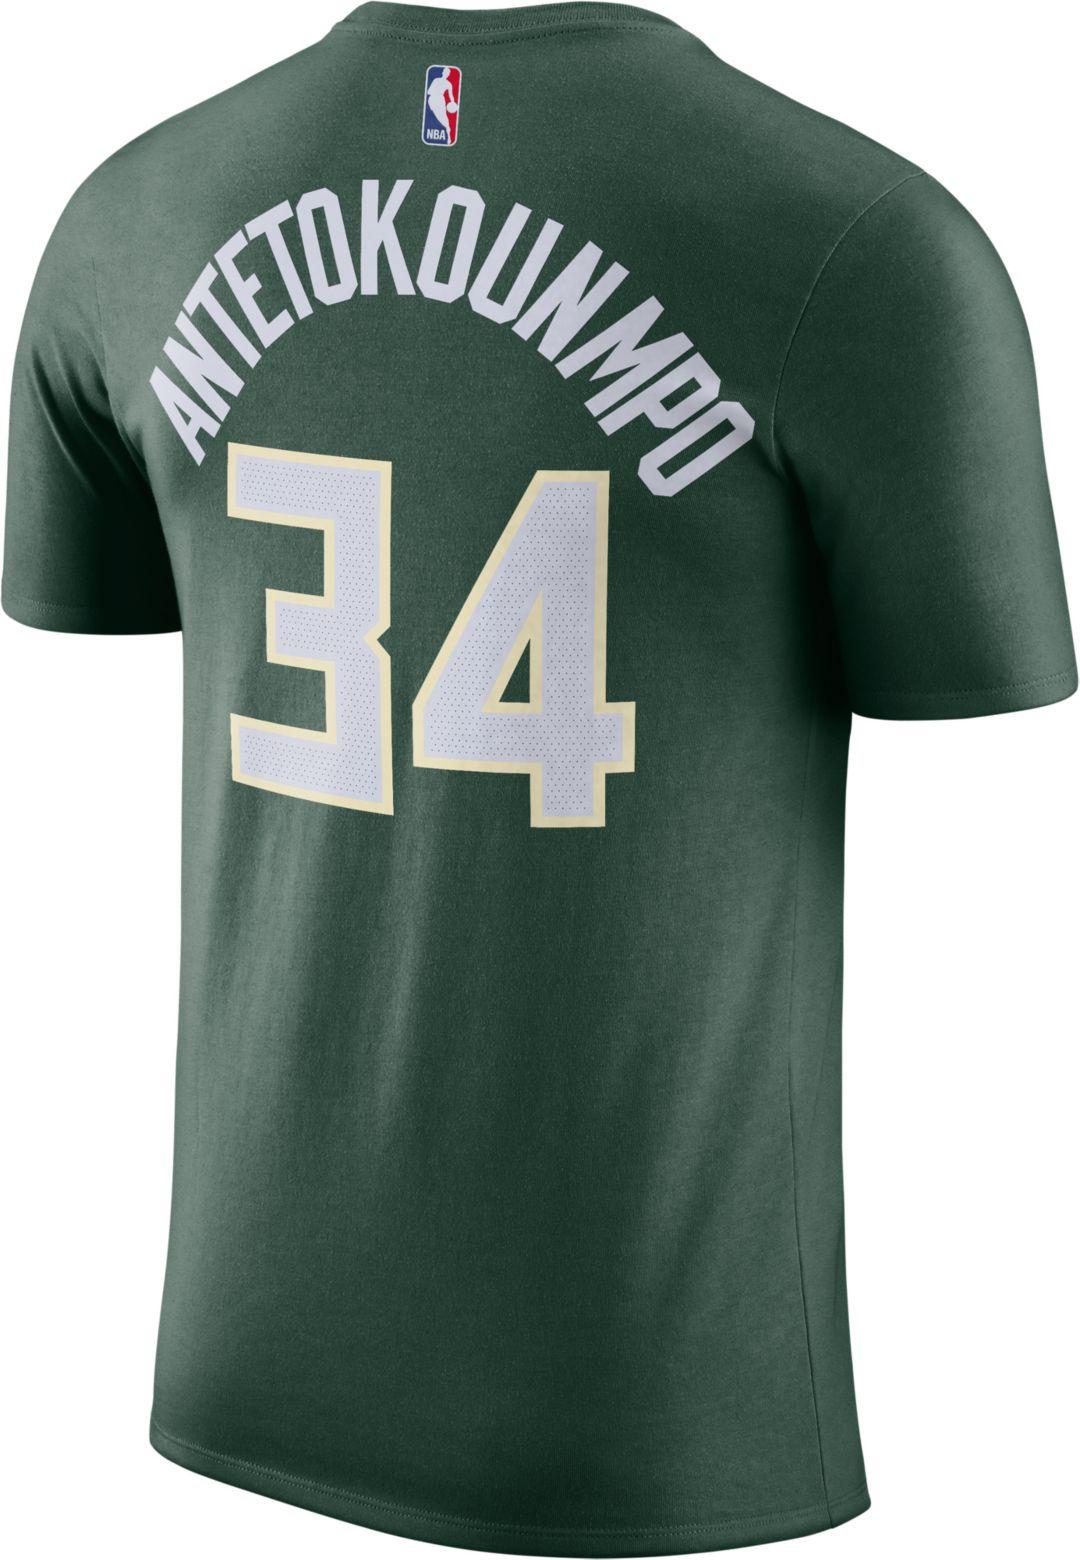 huge selection of 64a9e 8fc5a Nike Youth Milwaukee Bucks Giannis Antetokounmpo #34 Dri-FIT Green T-Shirt